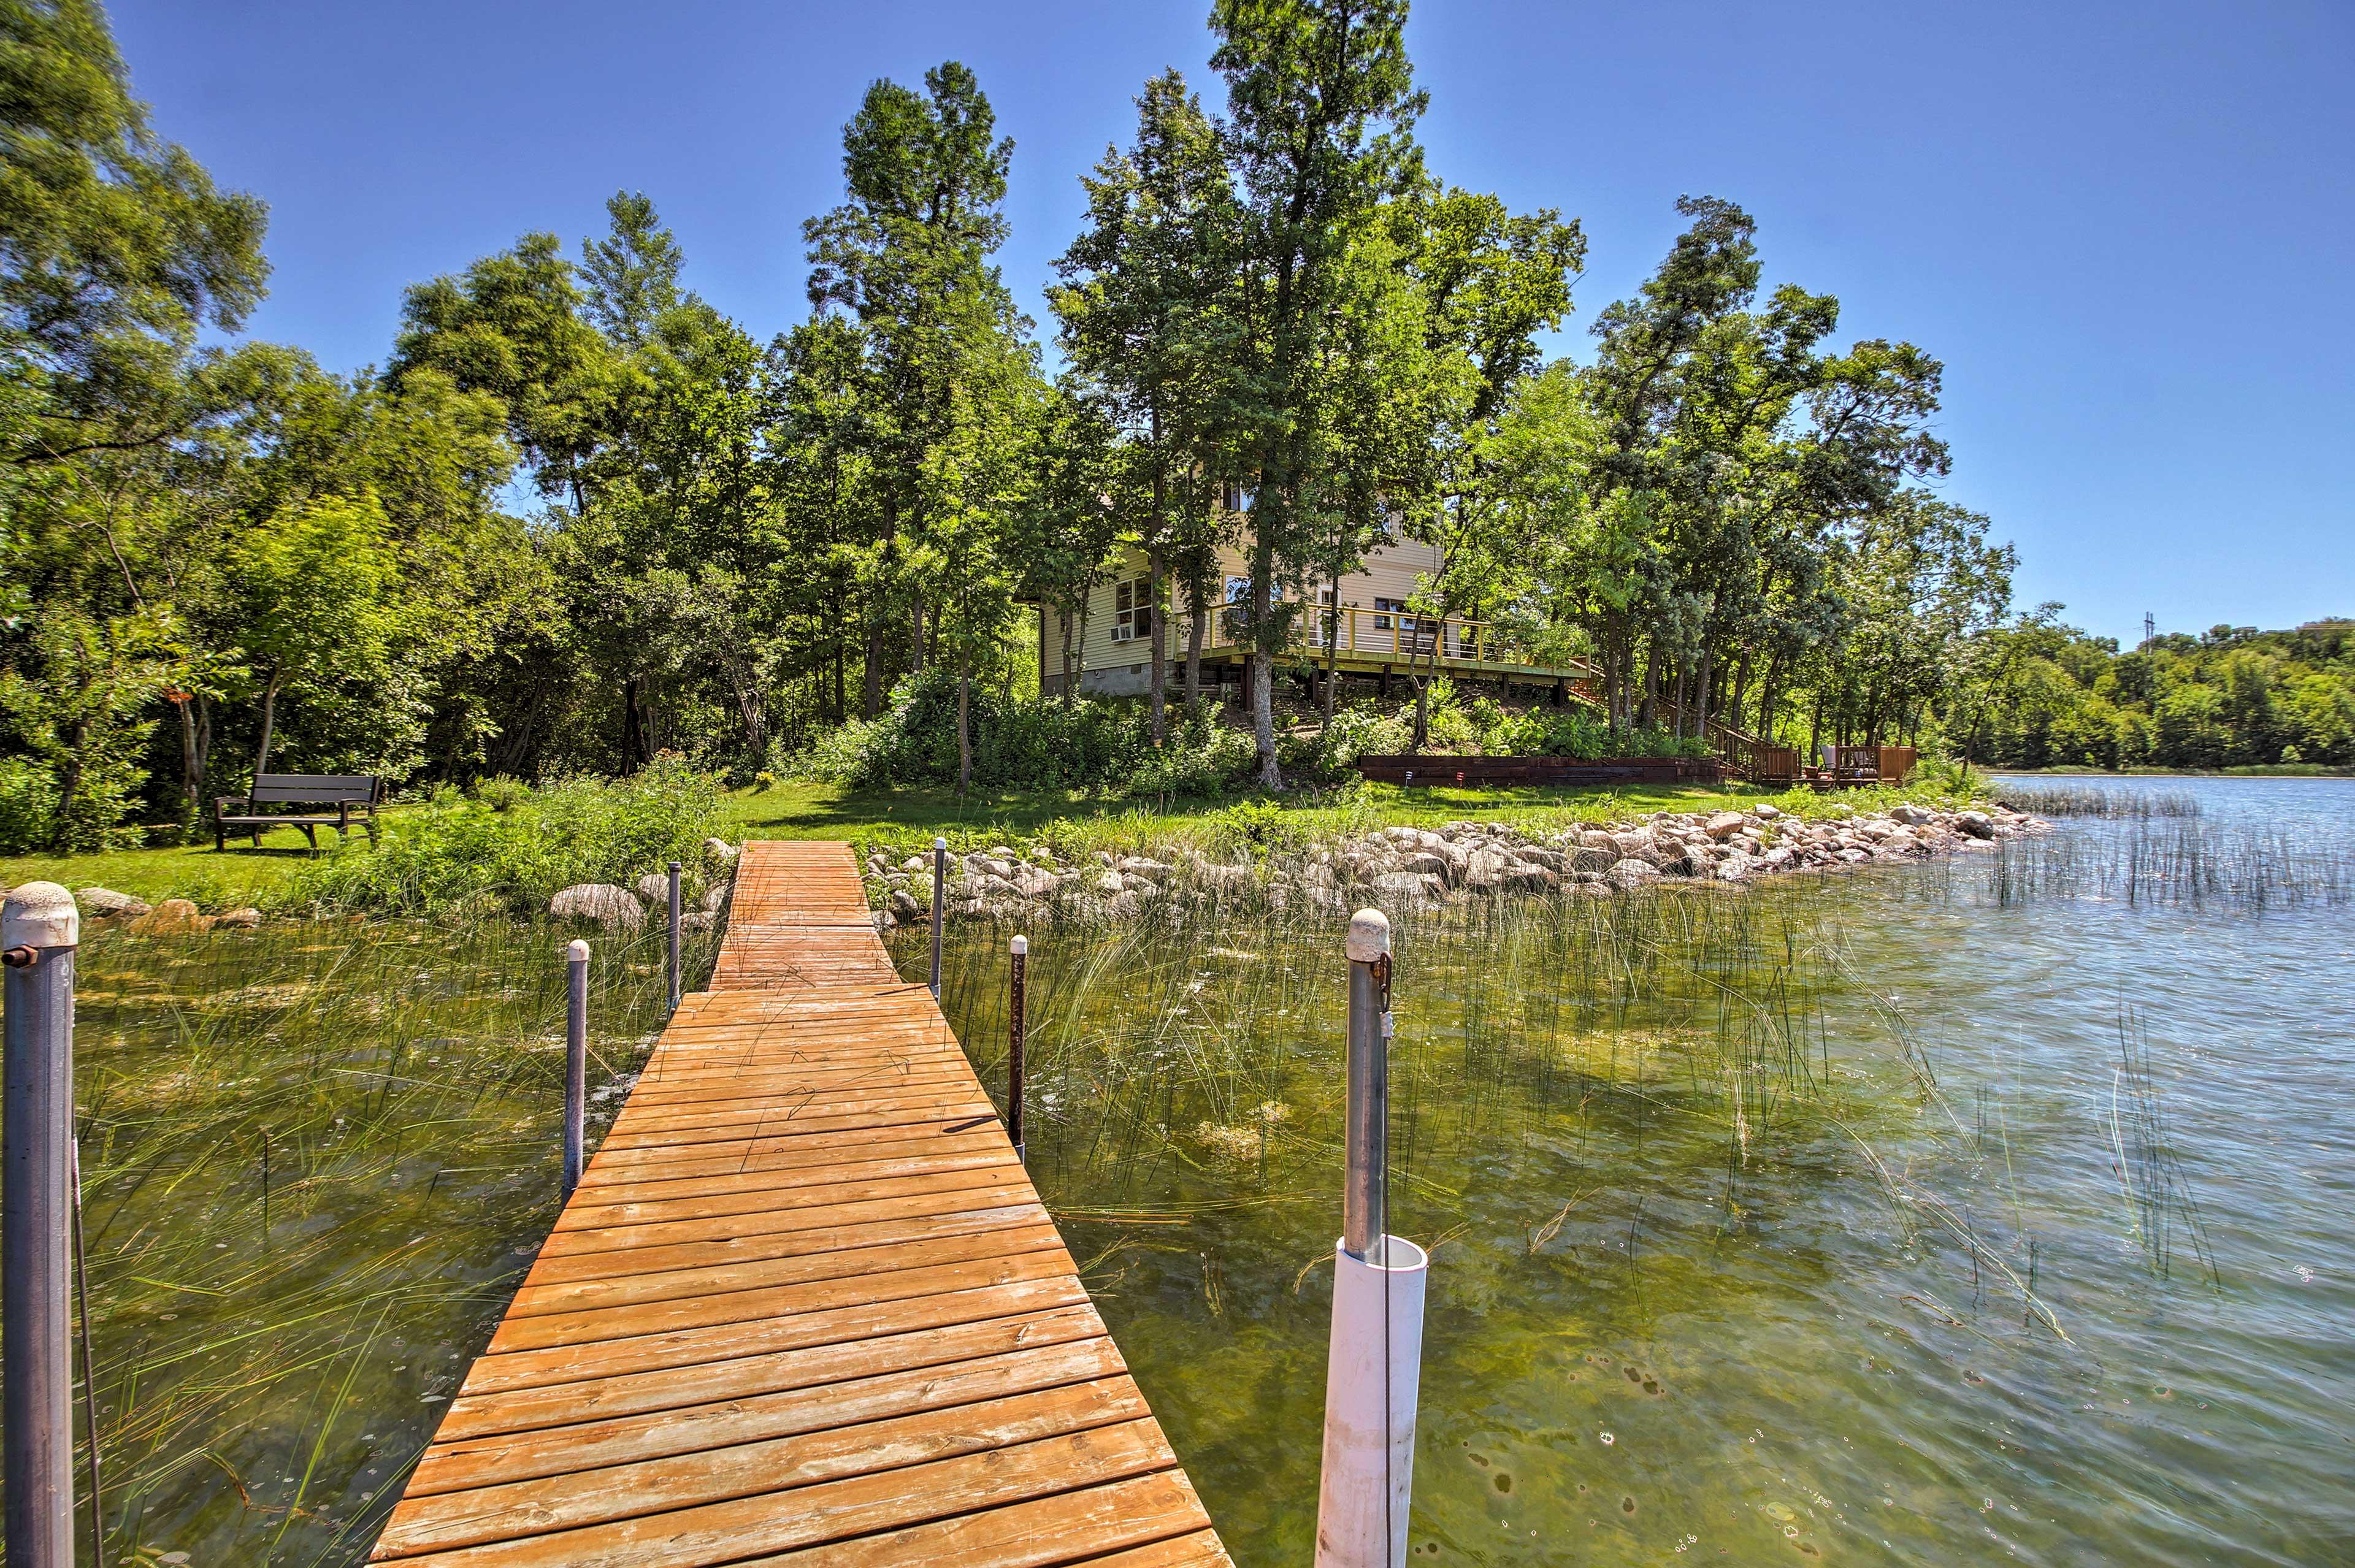 Go fishing or swim off the dock!